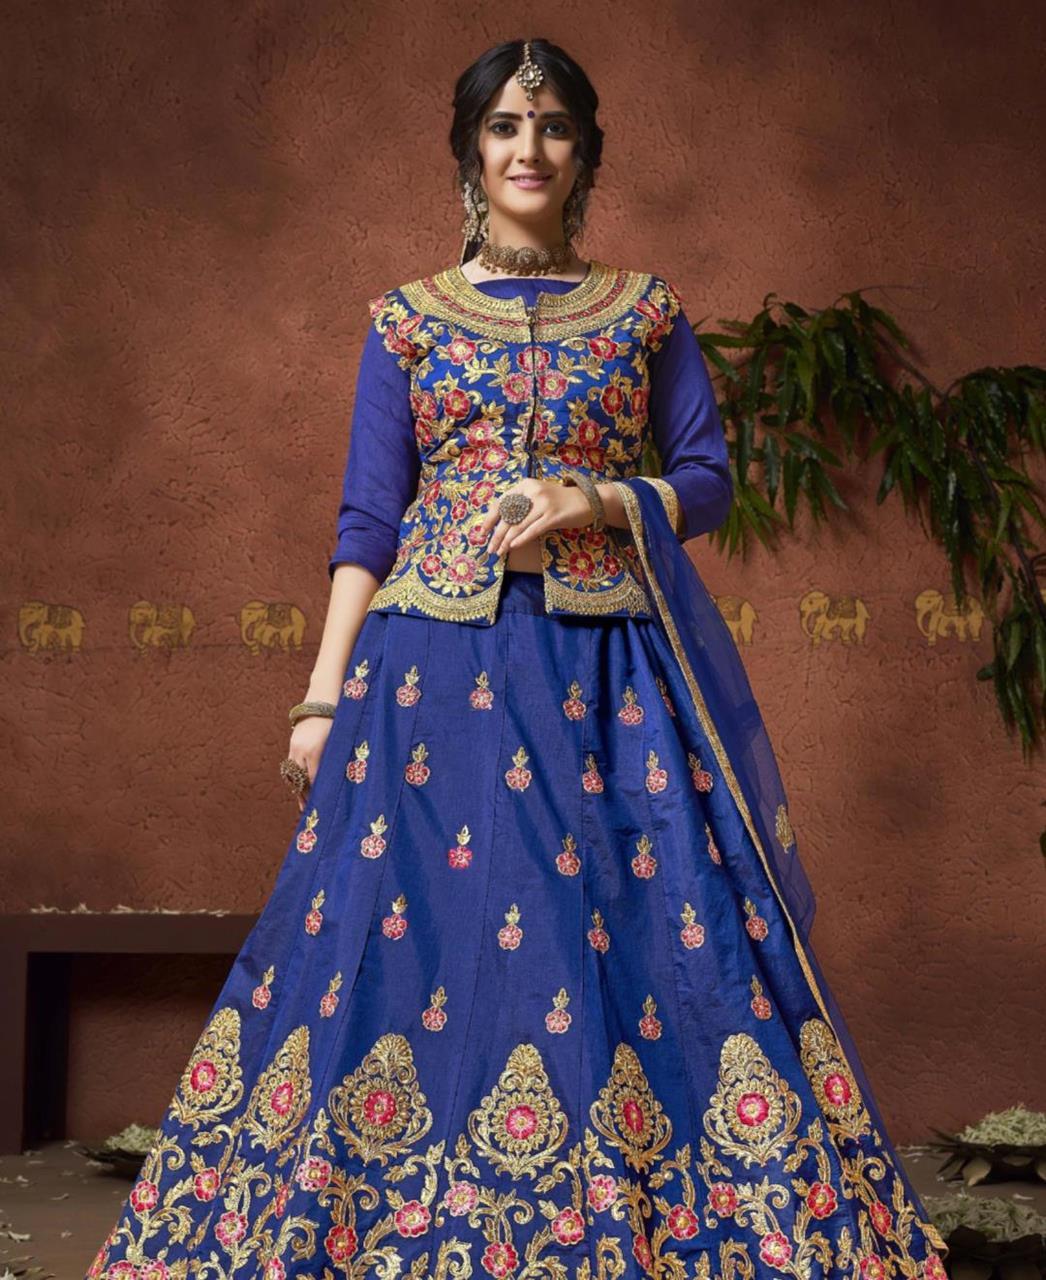 e898d4934a Embroidered Silk Blue Long choli Lehenga Choli Ghagra